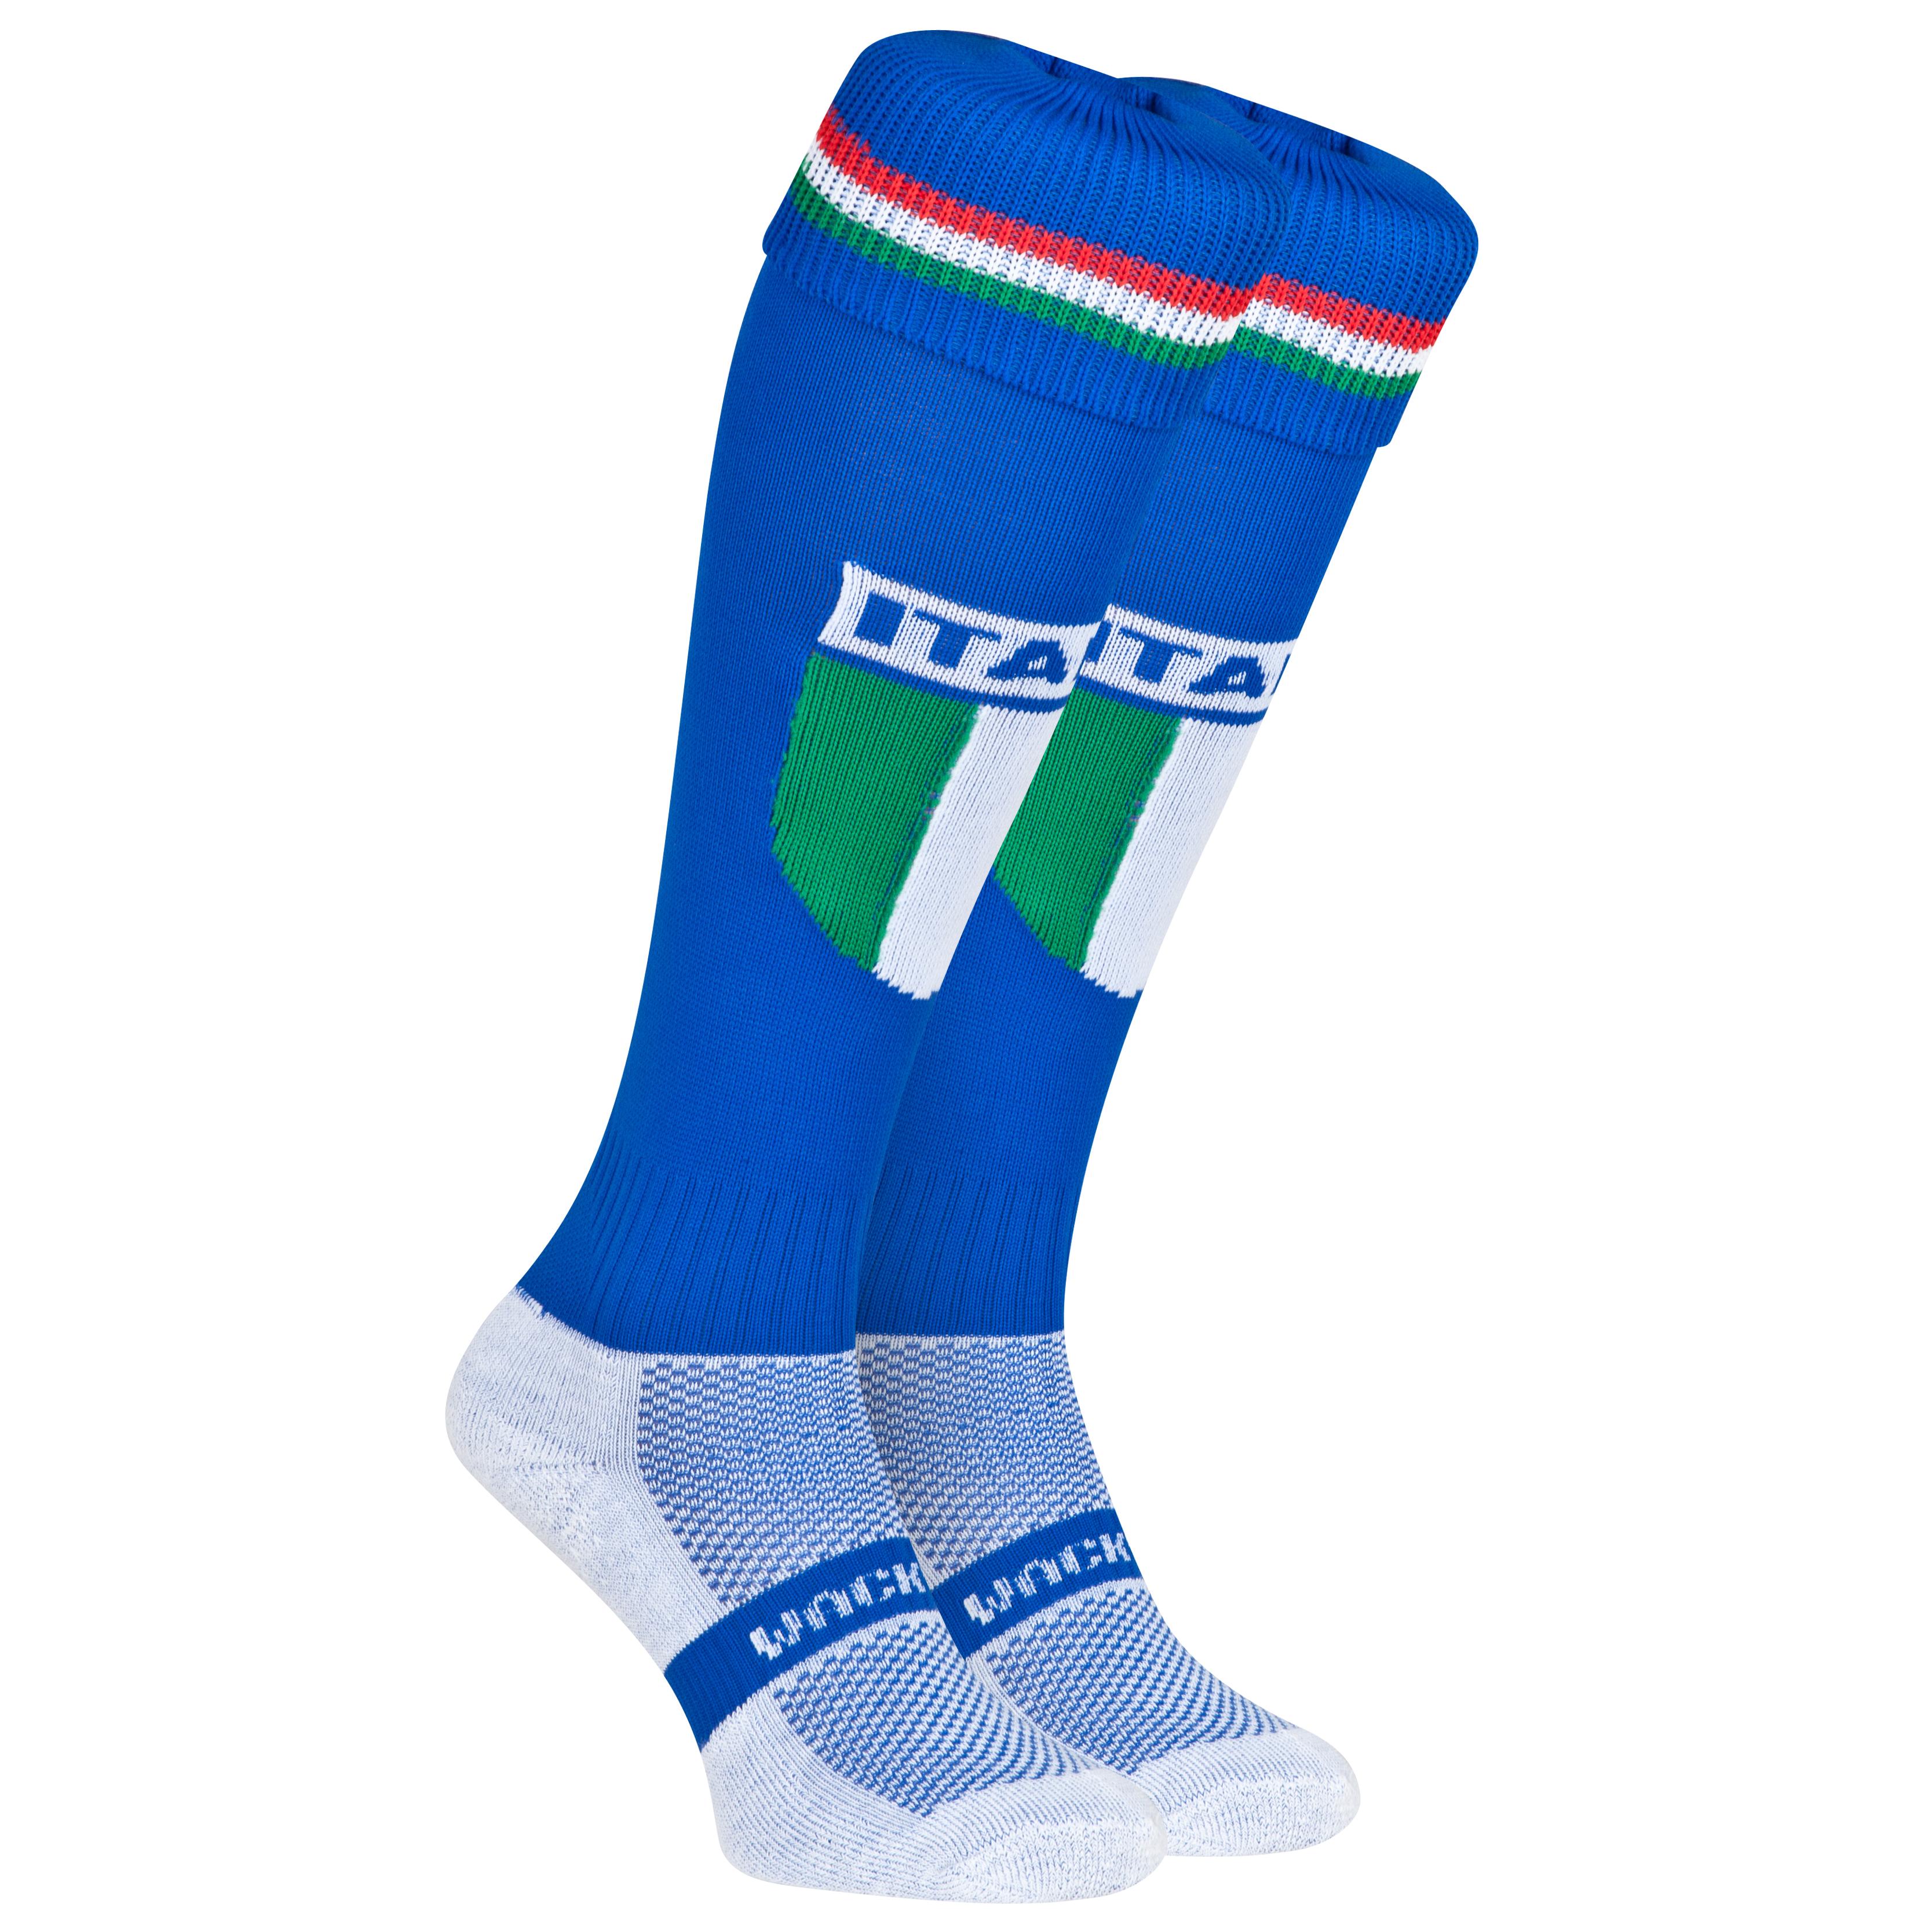 WackySox Socks - Size 2-6